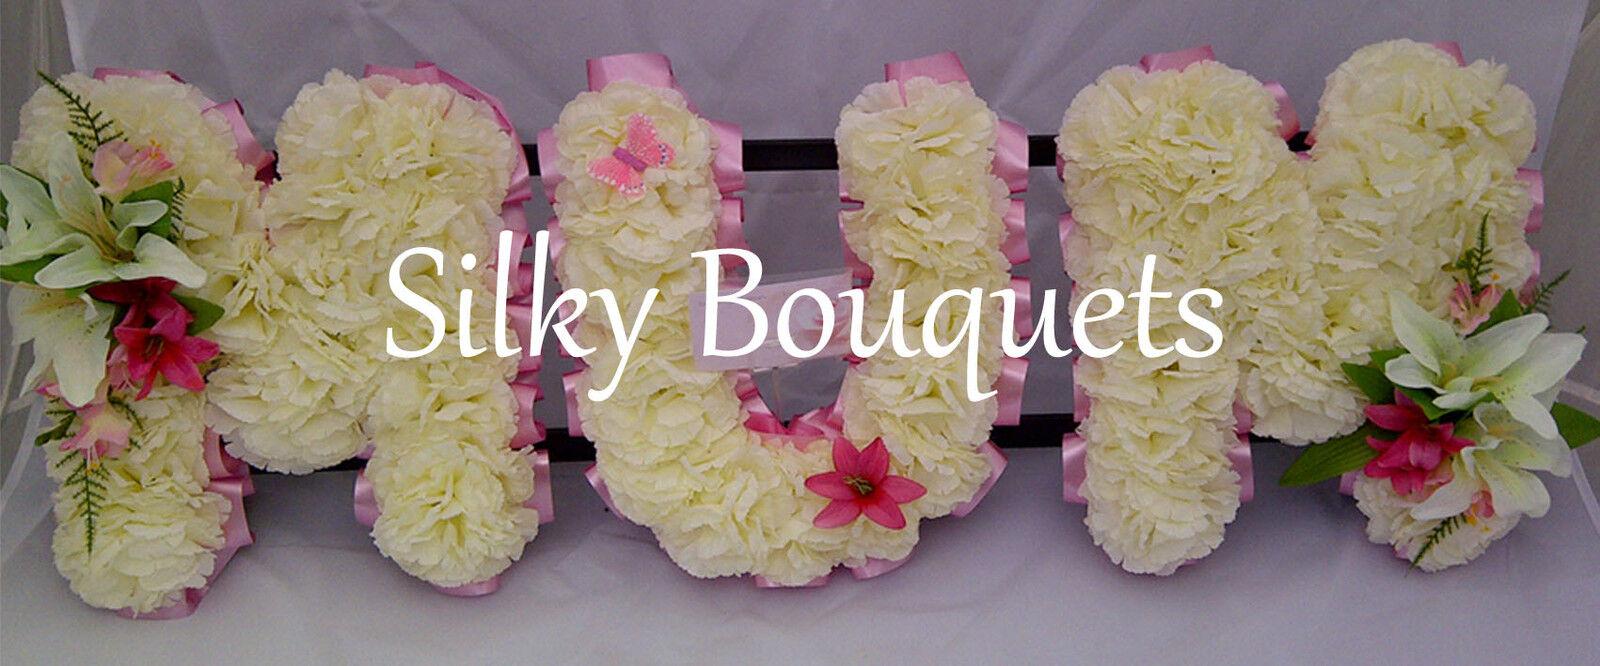 Mum Artificial Silk Funeral Flower Any 3 Letter Word Name Tribute Memorial Nan